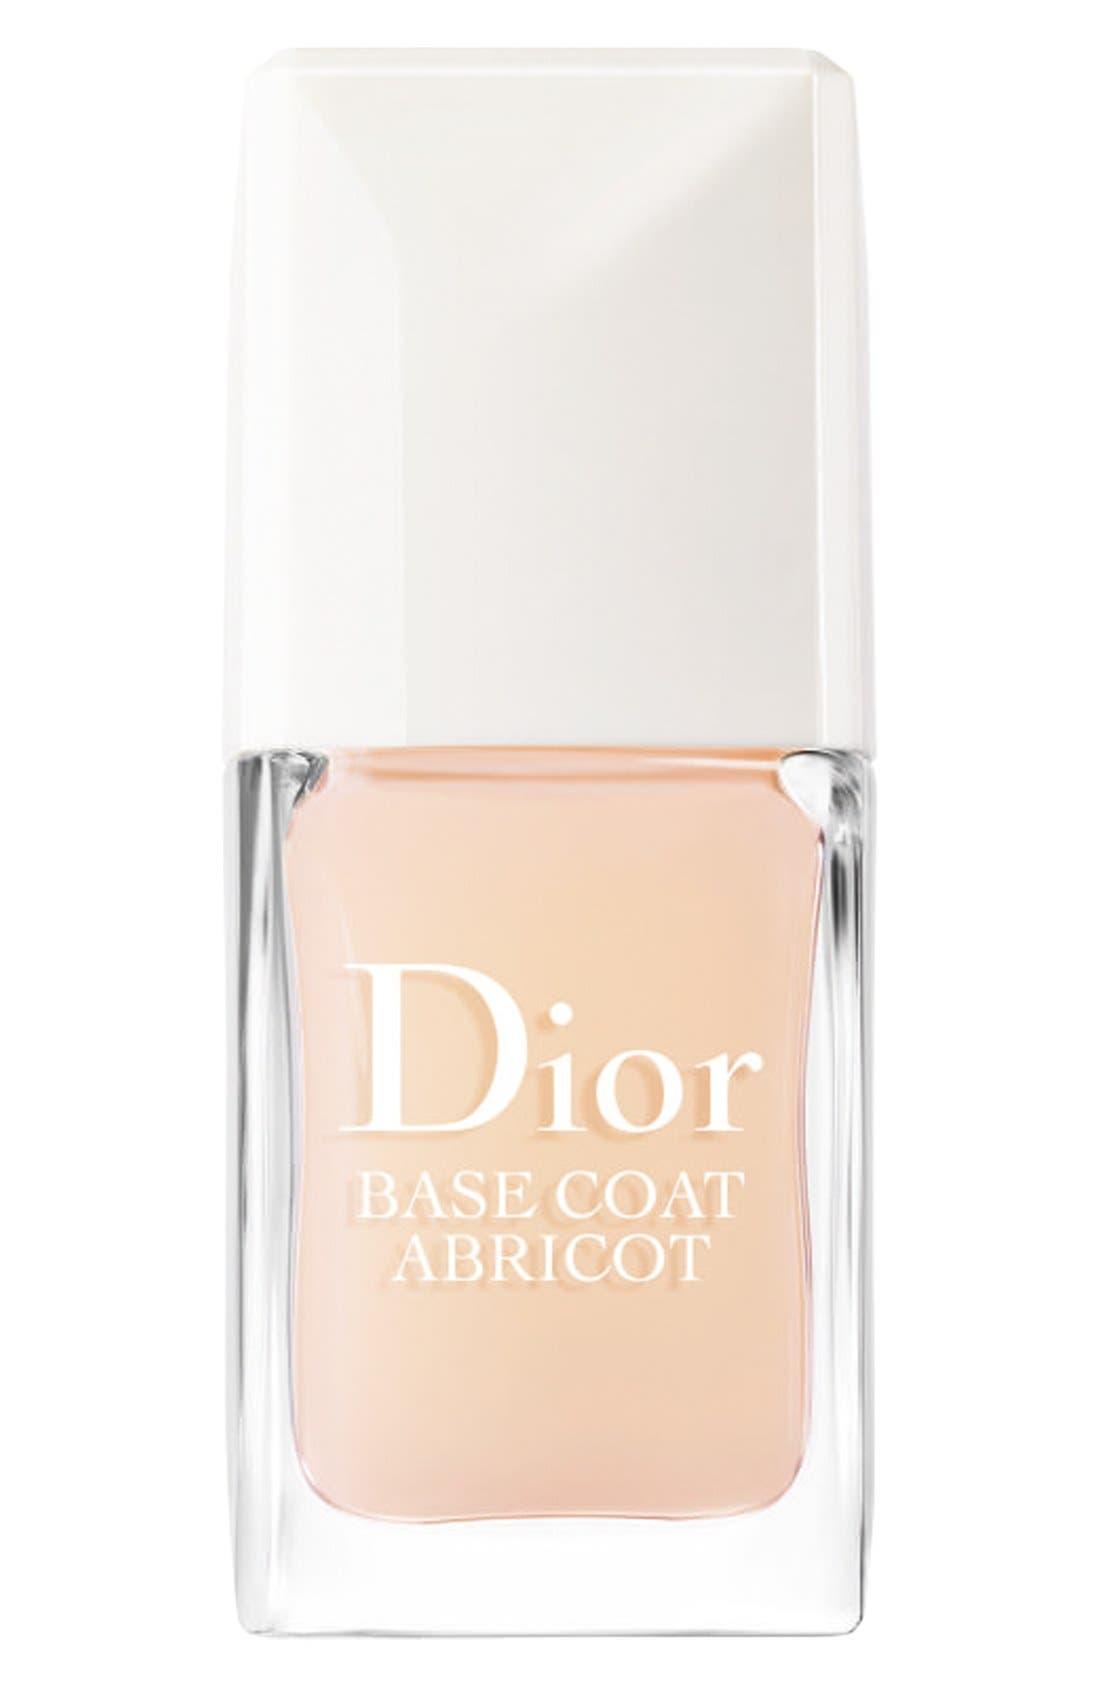 Dior 'Crème Abricot' Base Coat